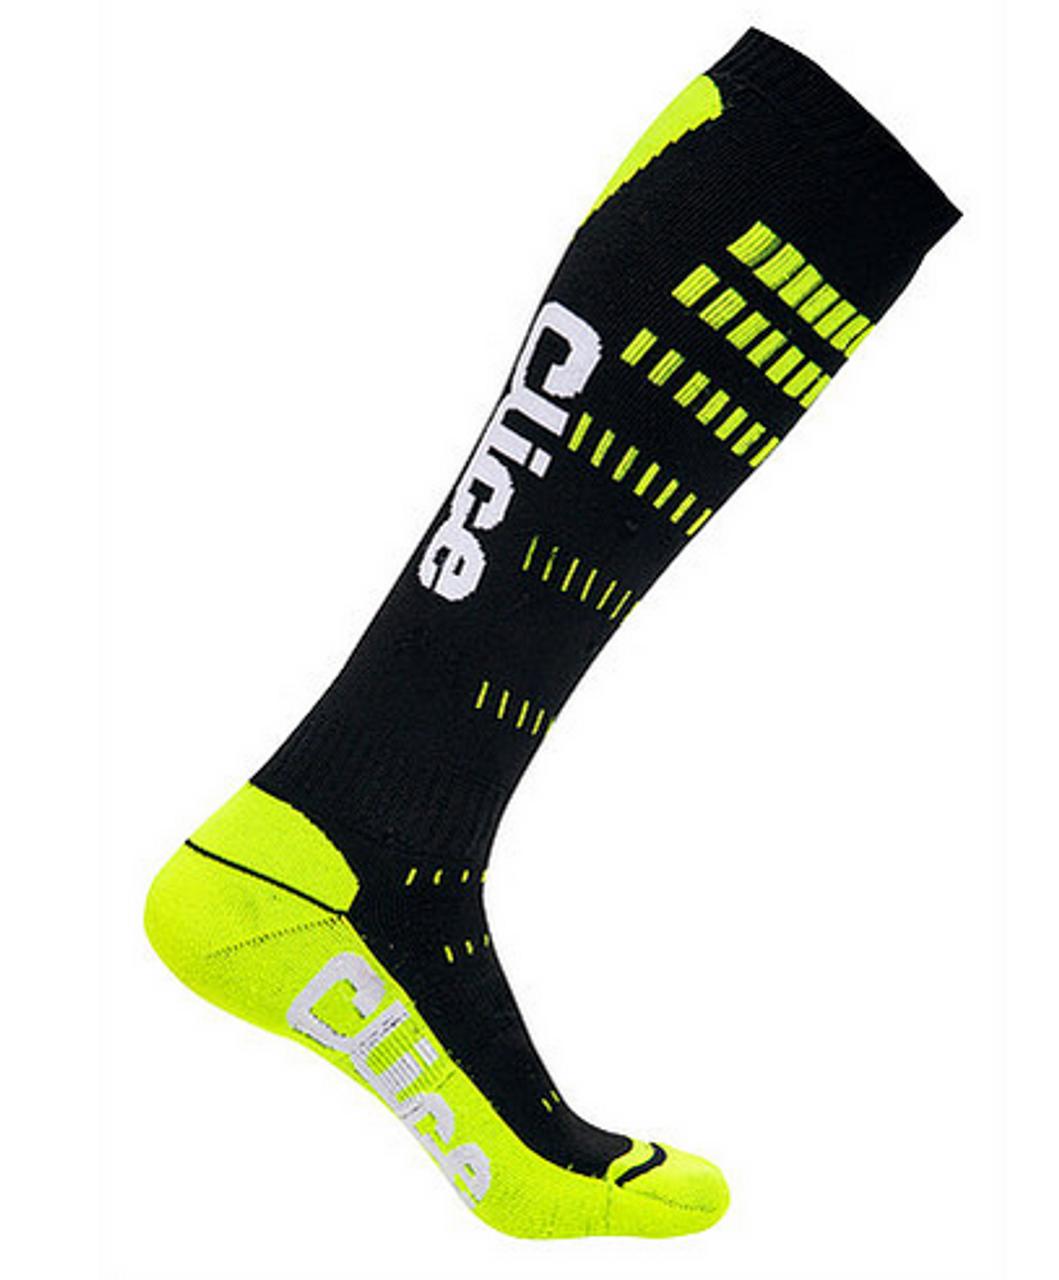 Long socks Clice inside foot